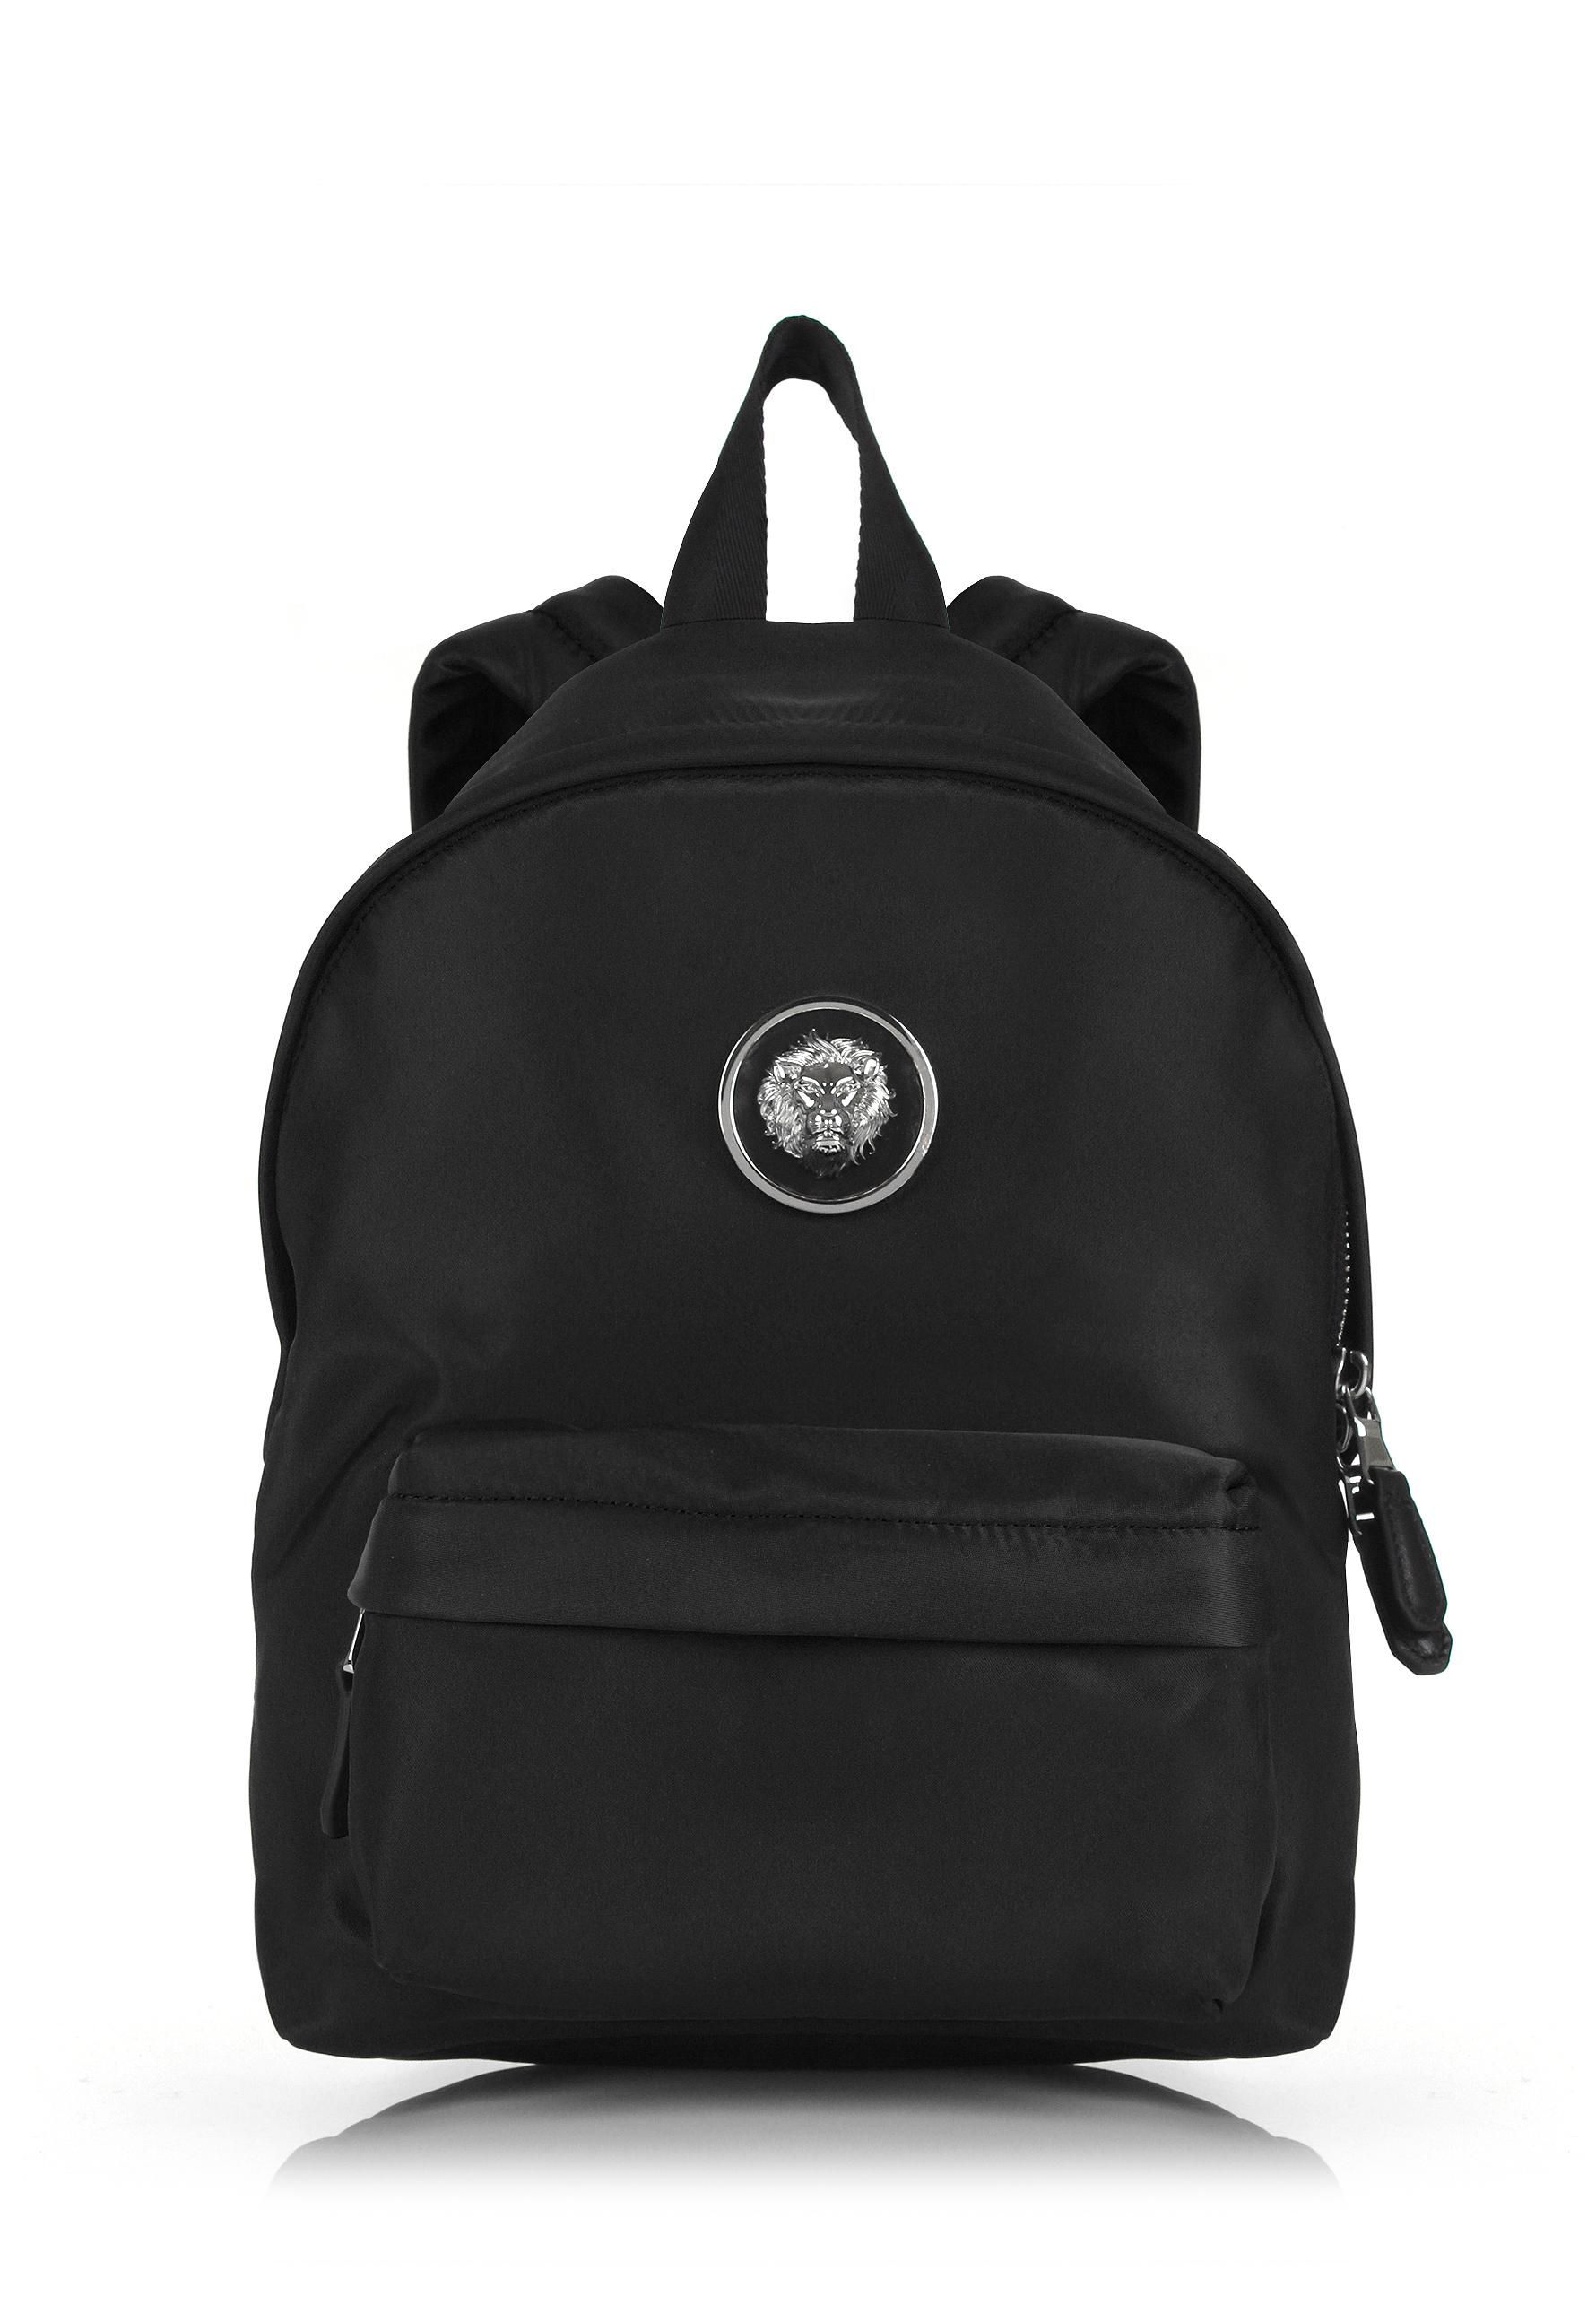 eda359f9367b Lyst - Versus Small Nylon Lion Head Backpack Black nickel in Black